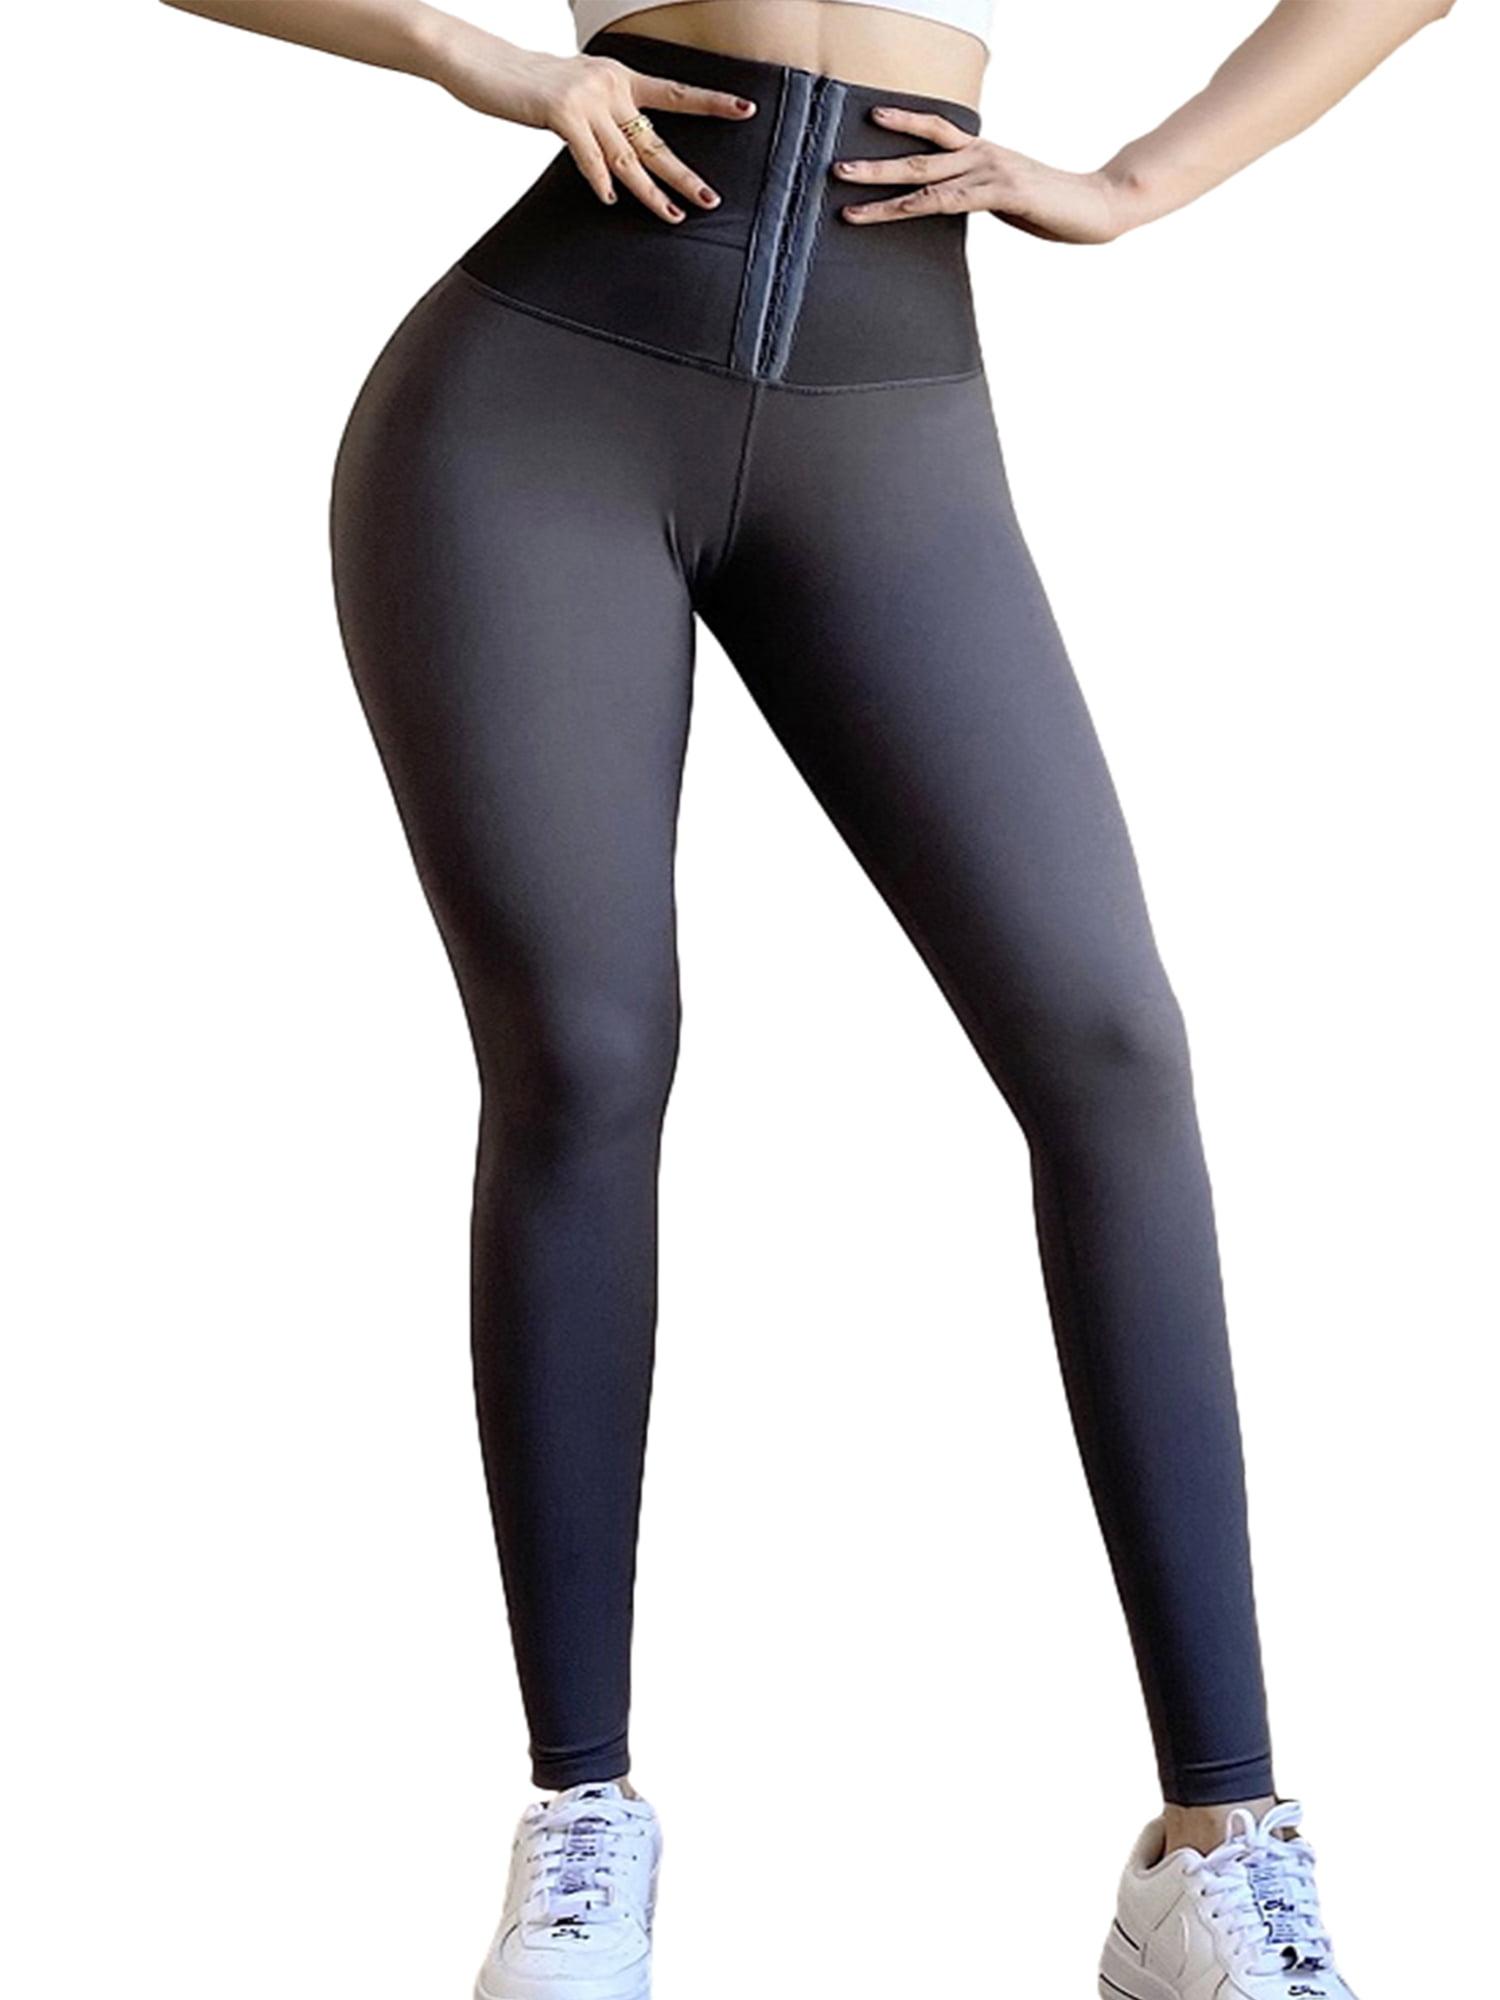 Womens Seamless Leggings Stretch Gym Butt Lift Sports Fitness Yoga Pants Shark